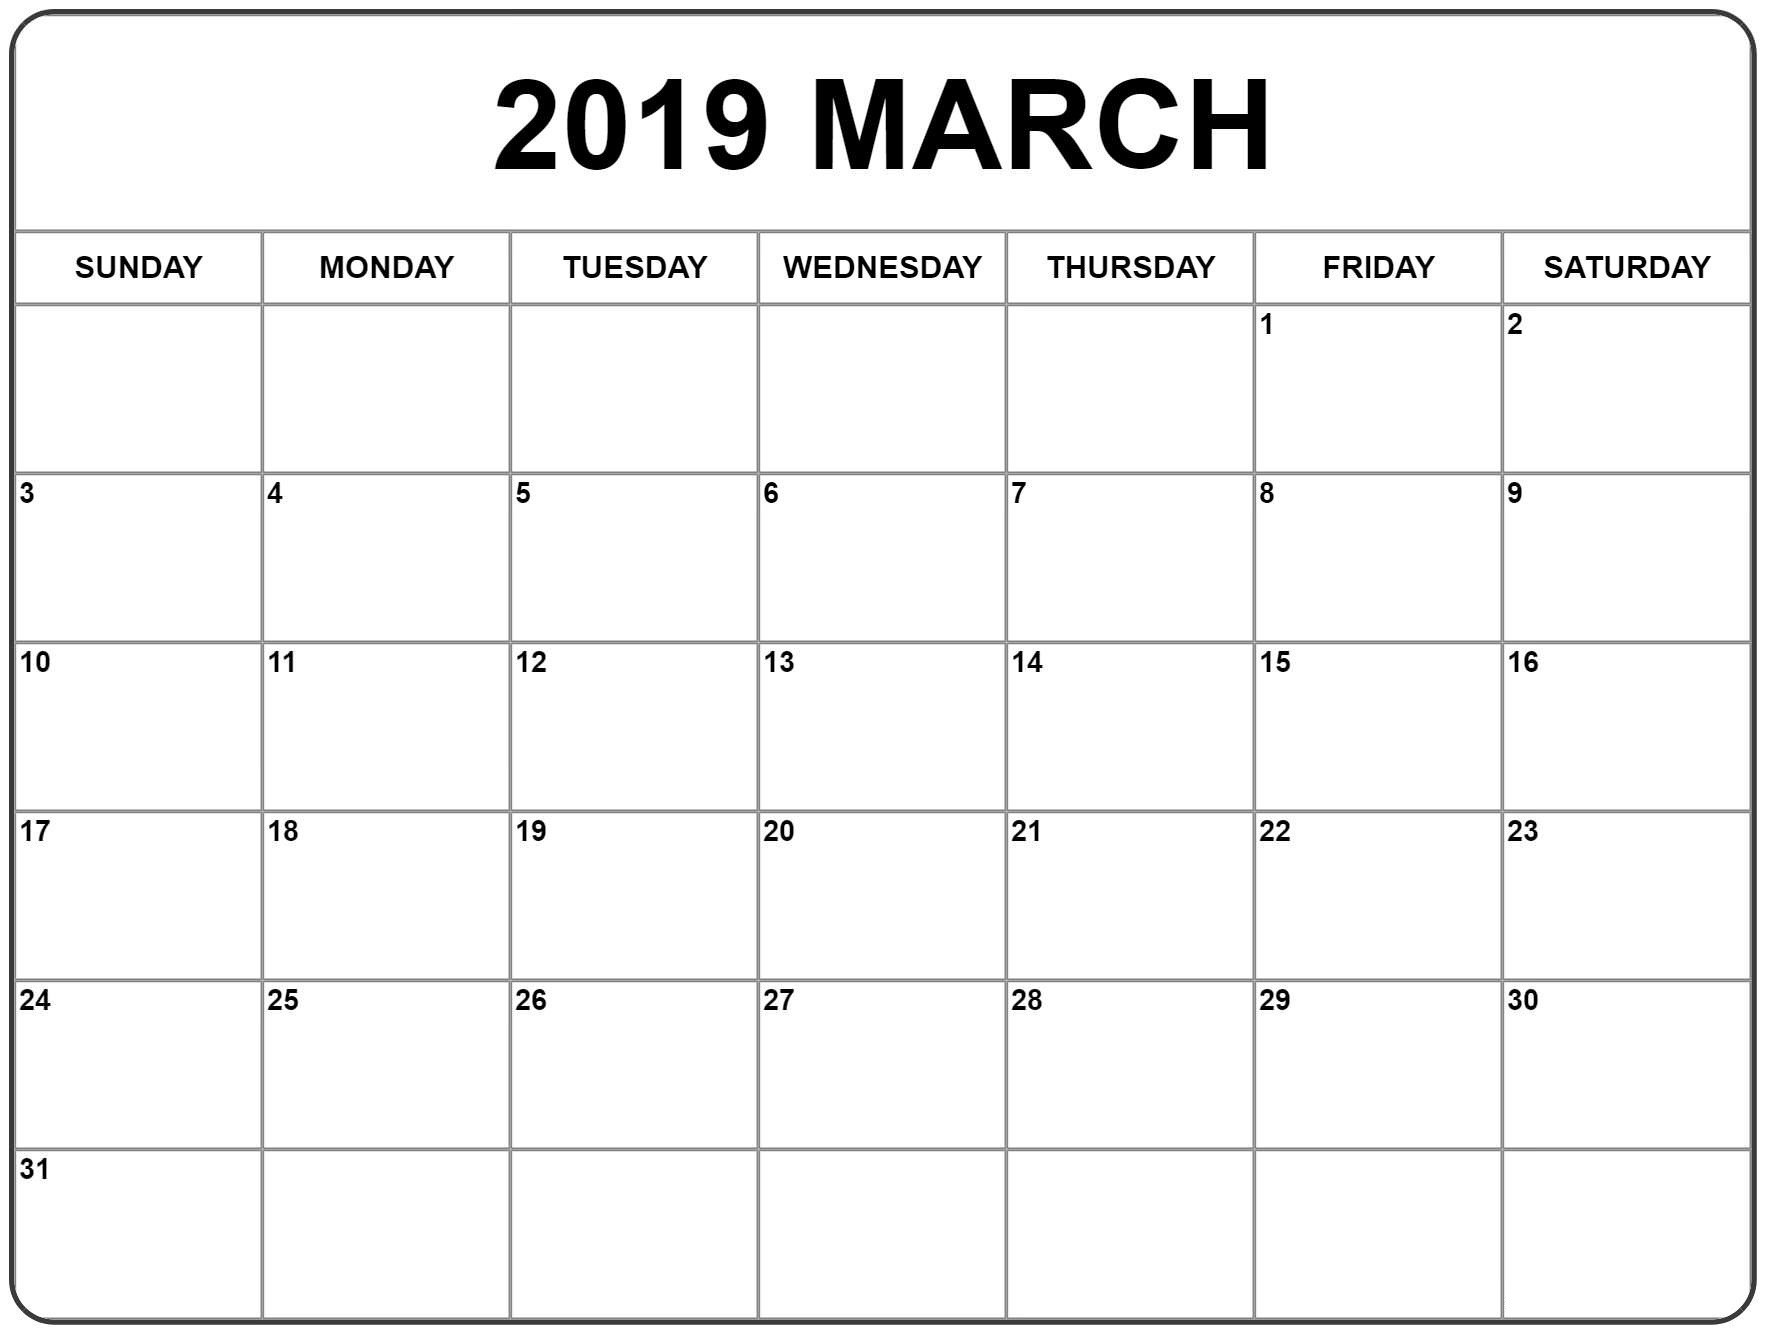 March 2019 Calendar Page Free Printable – Printable 2018